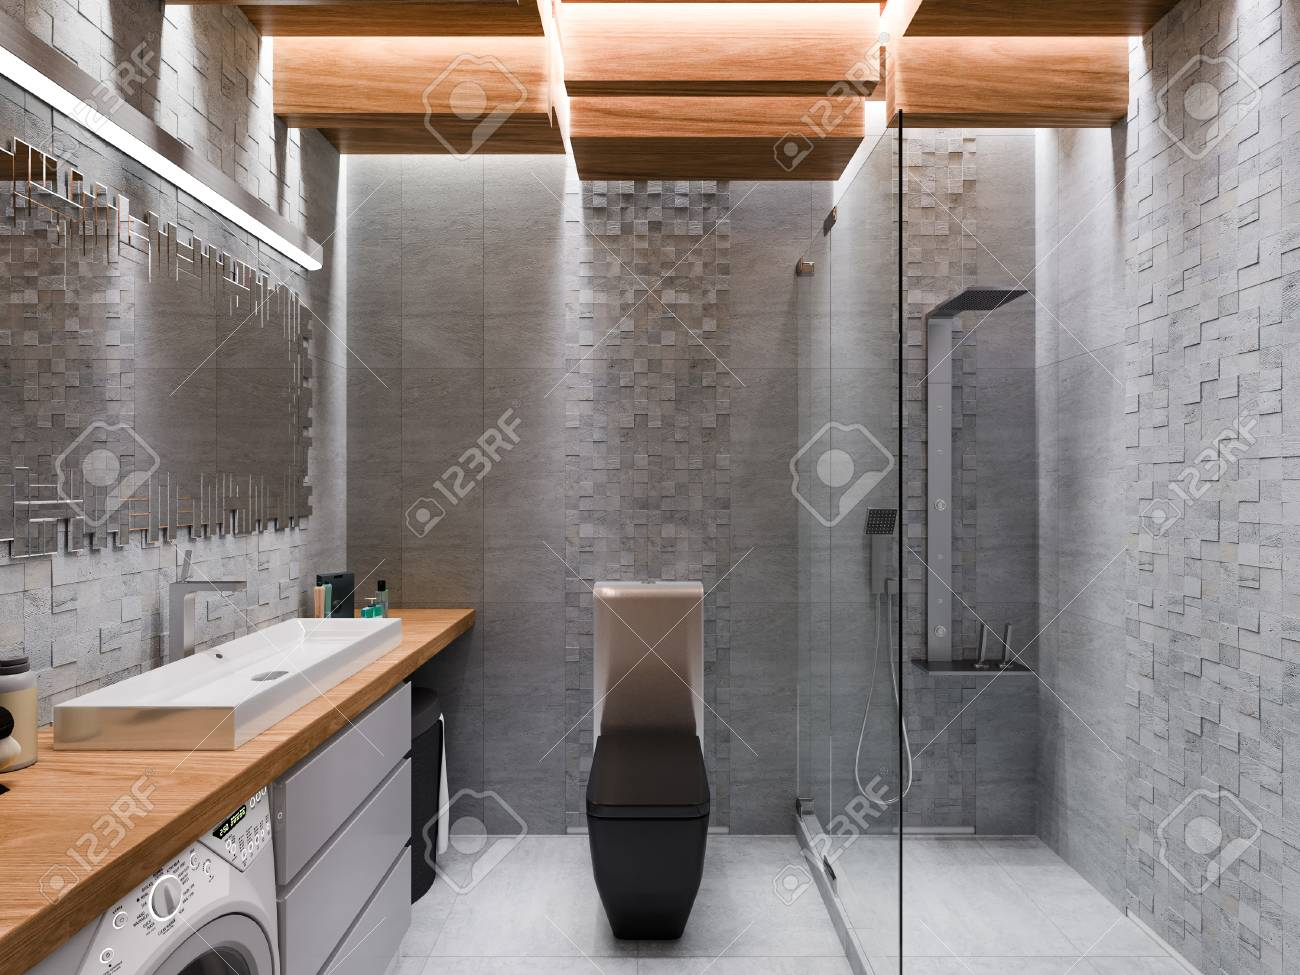 Badkamer Pimpen Badkamerverlichting : Badkamerverlichting led plafond looox light collection eclairage